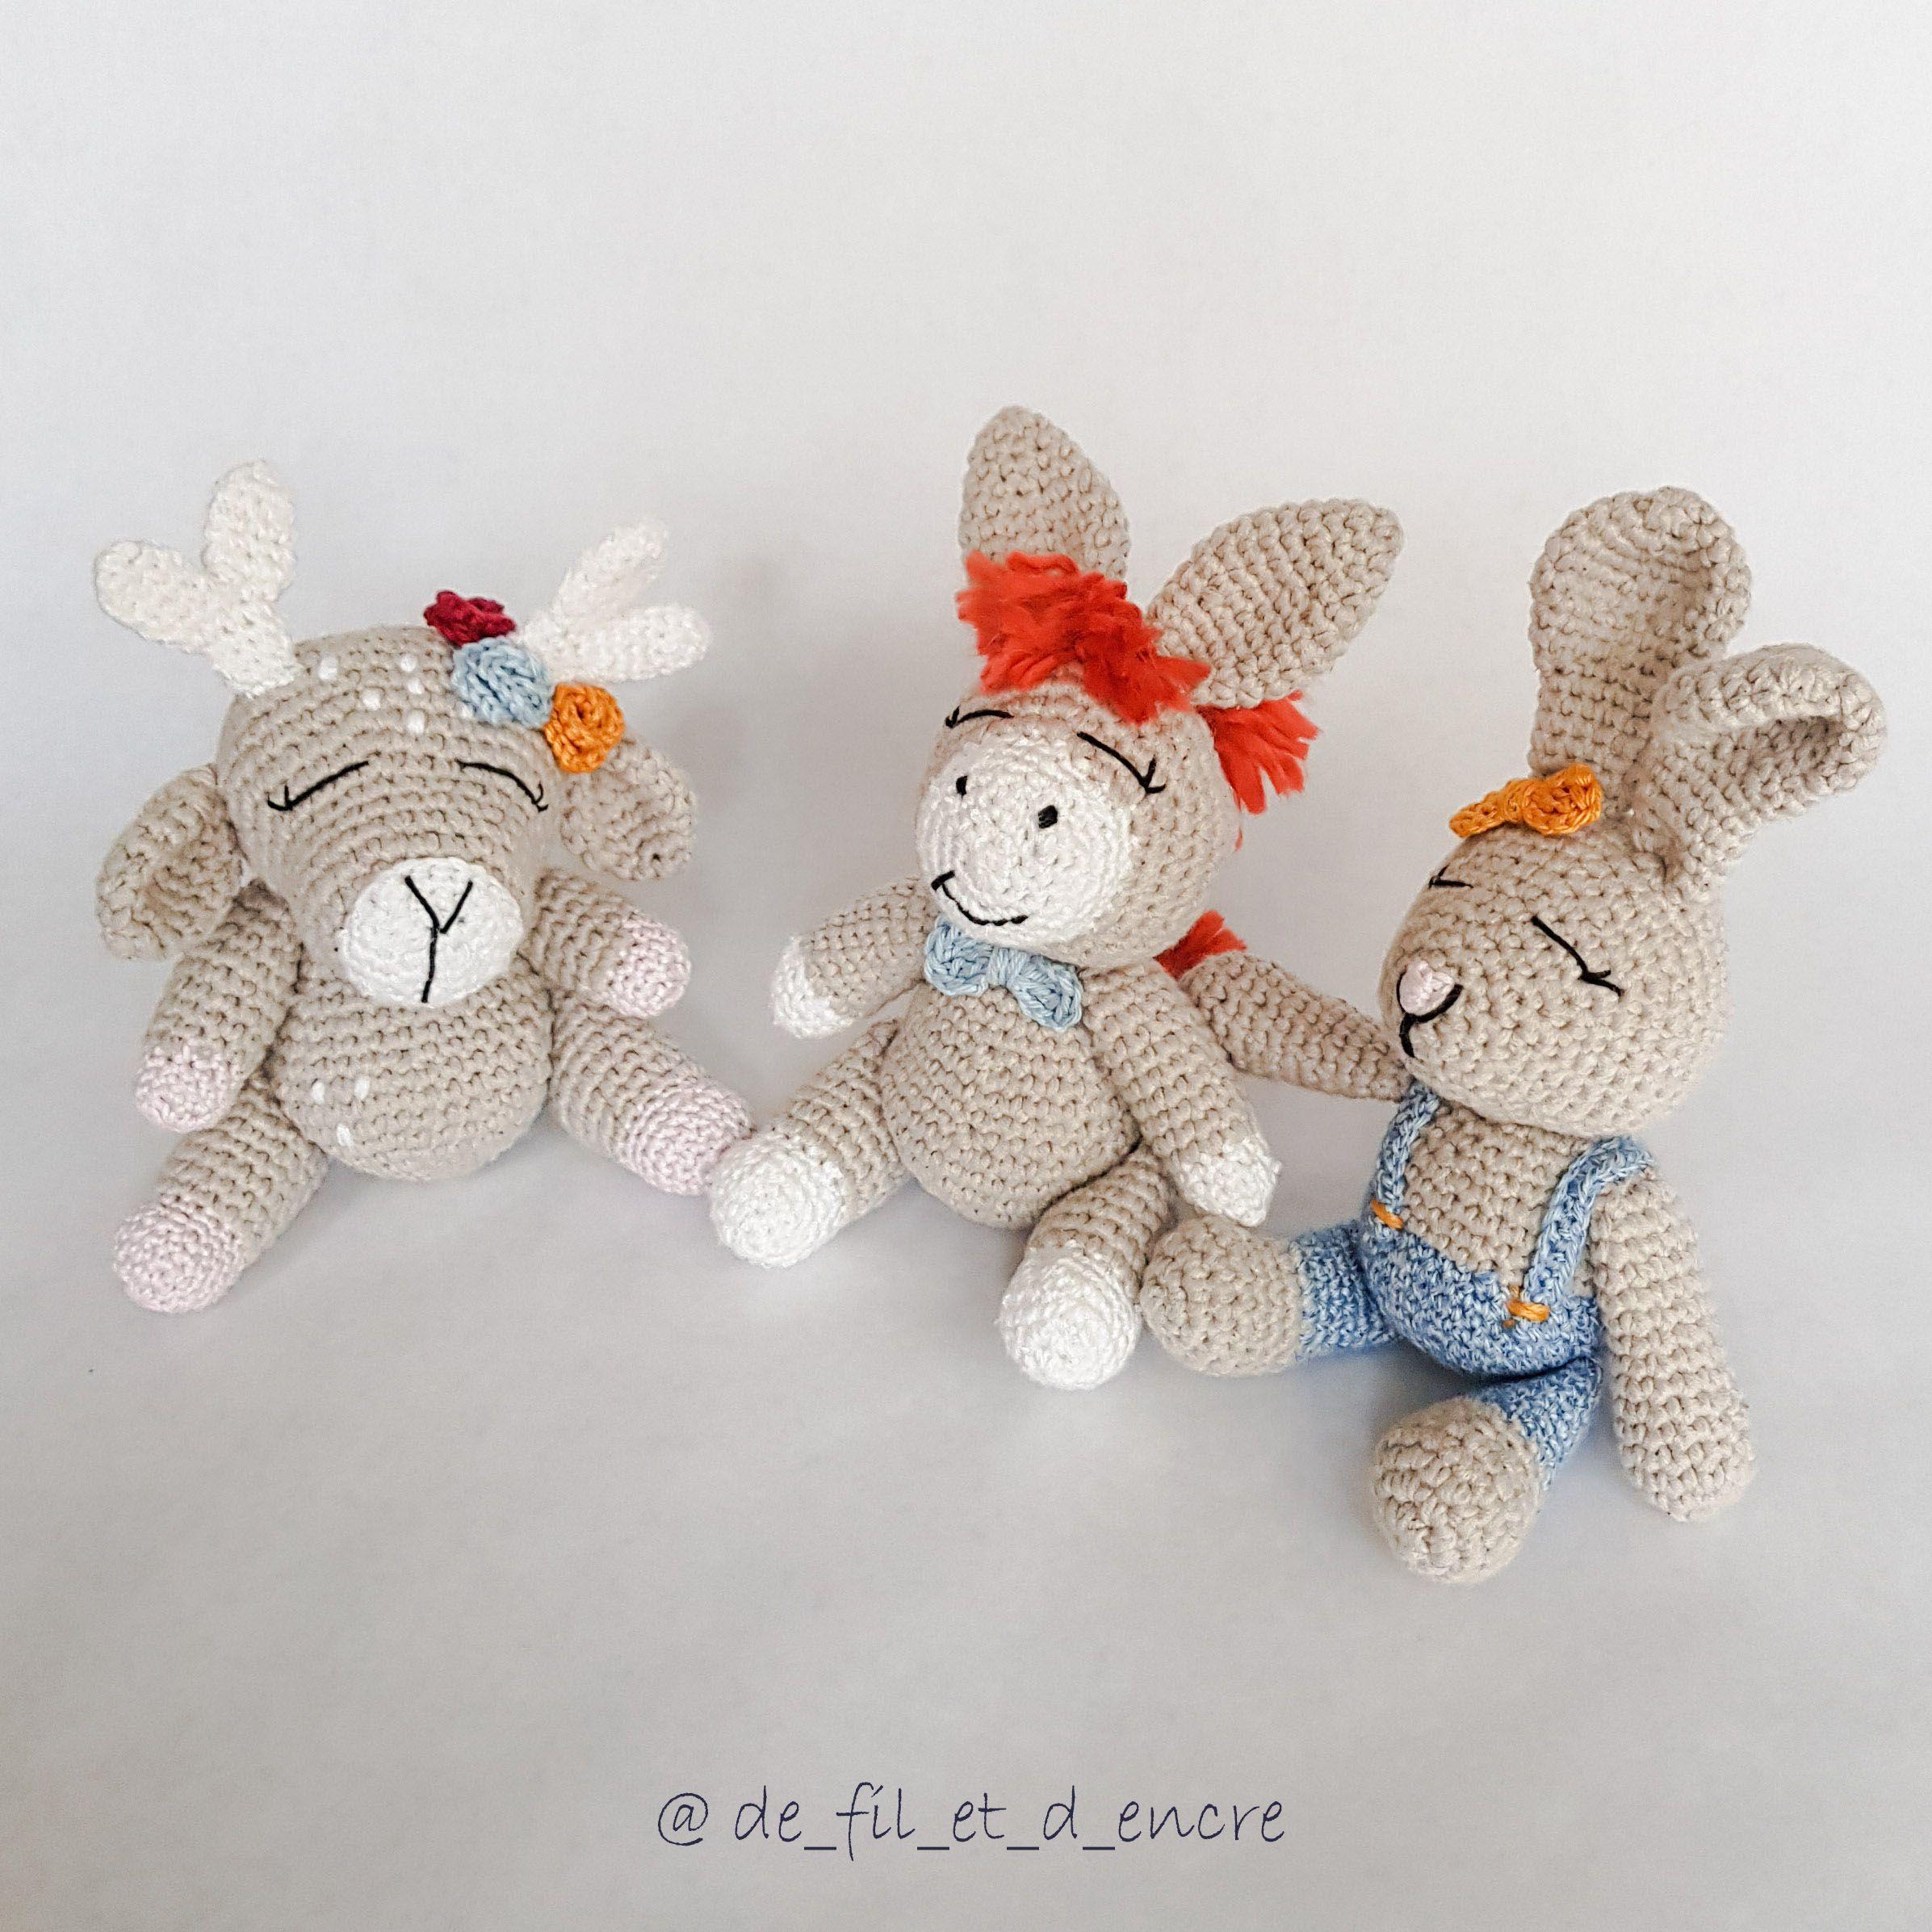 c0e86808ac77 modèle crochet amiguruimi bichette  amigurumi  patron  modèle  mignon  DIY   crochet